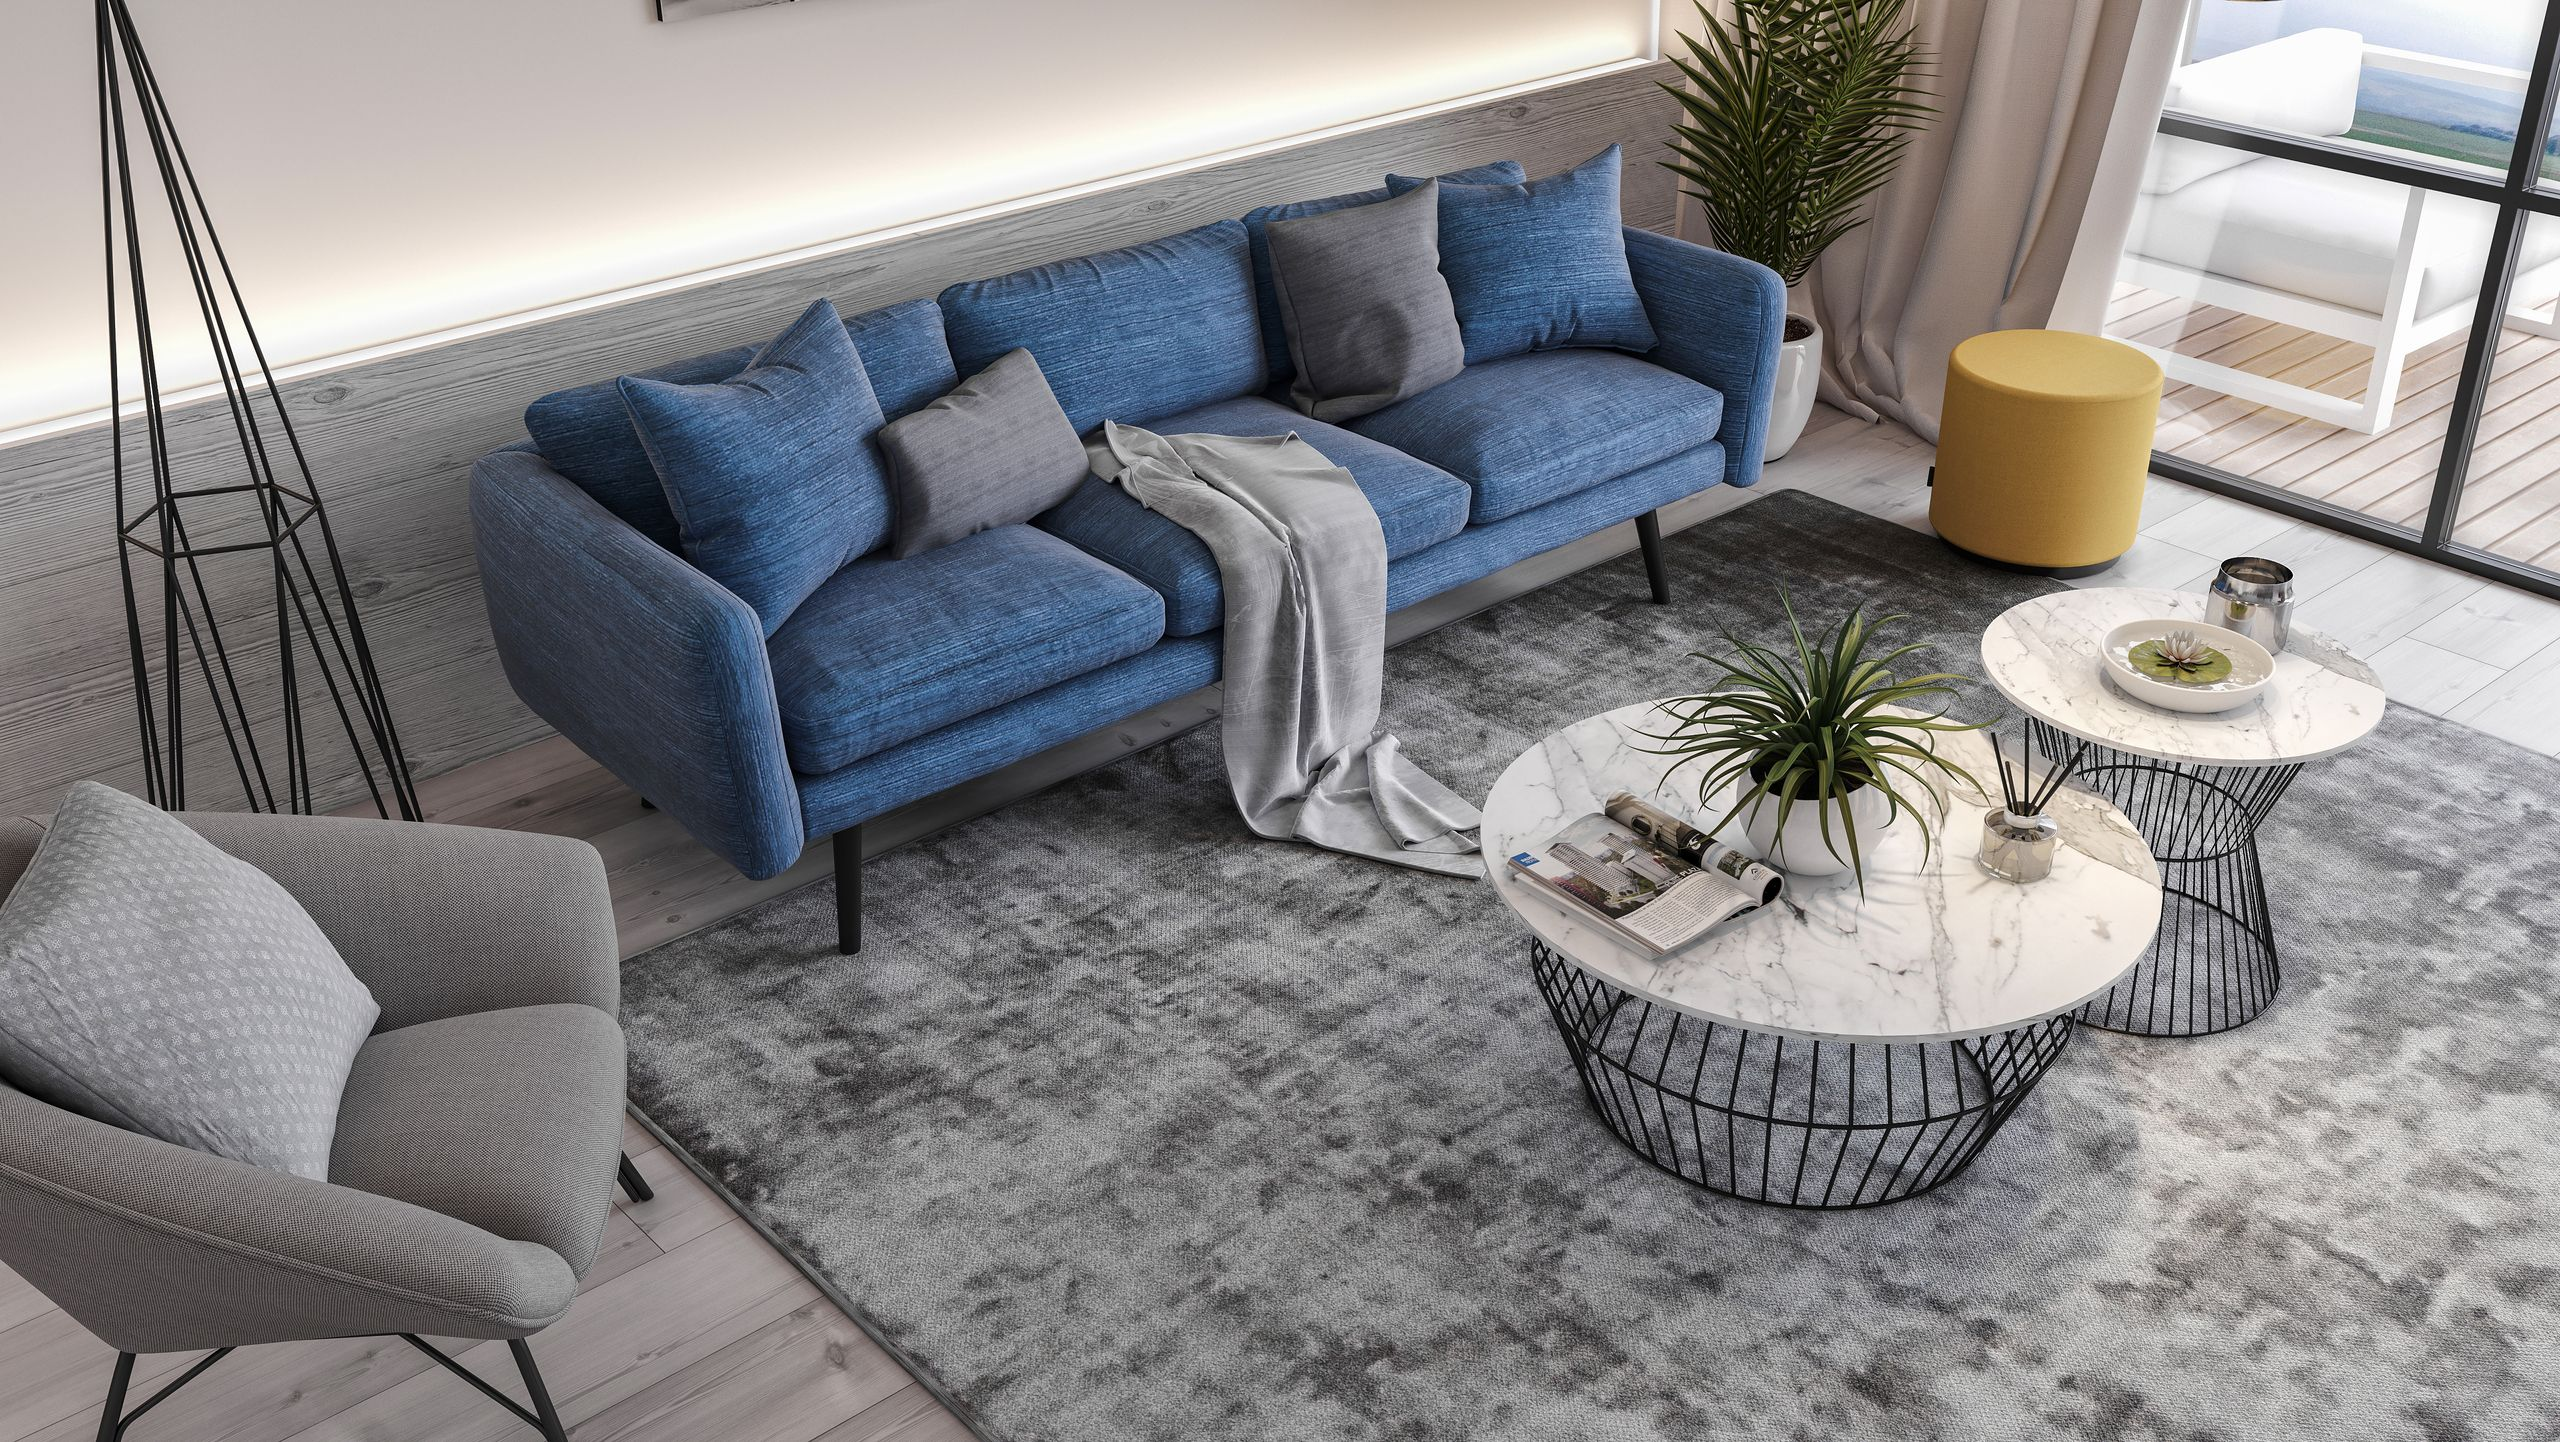 The smarter way to buy furniture modanifurniture homedecor